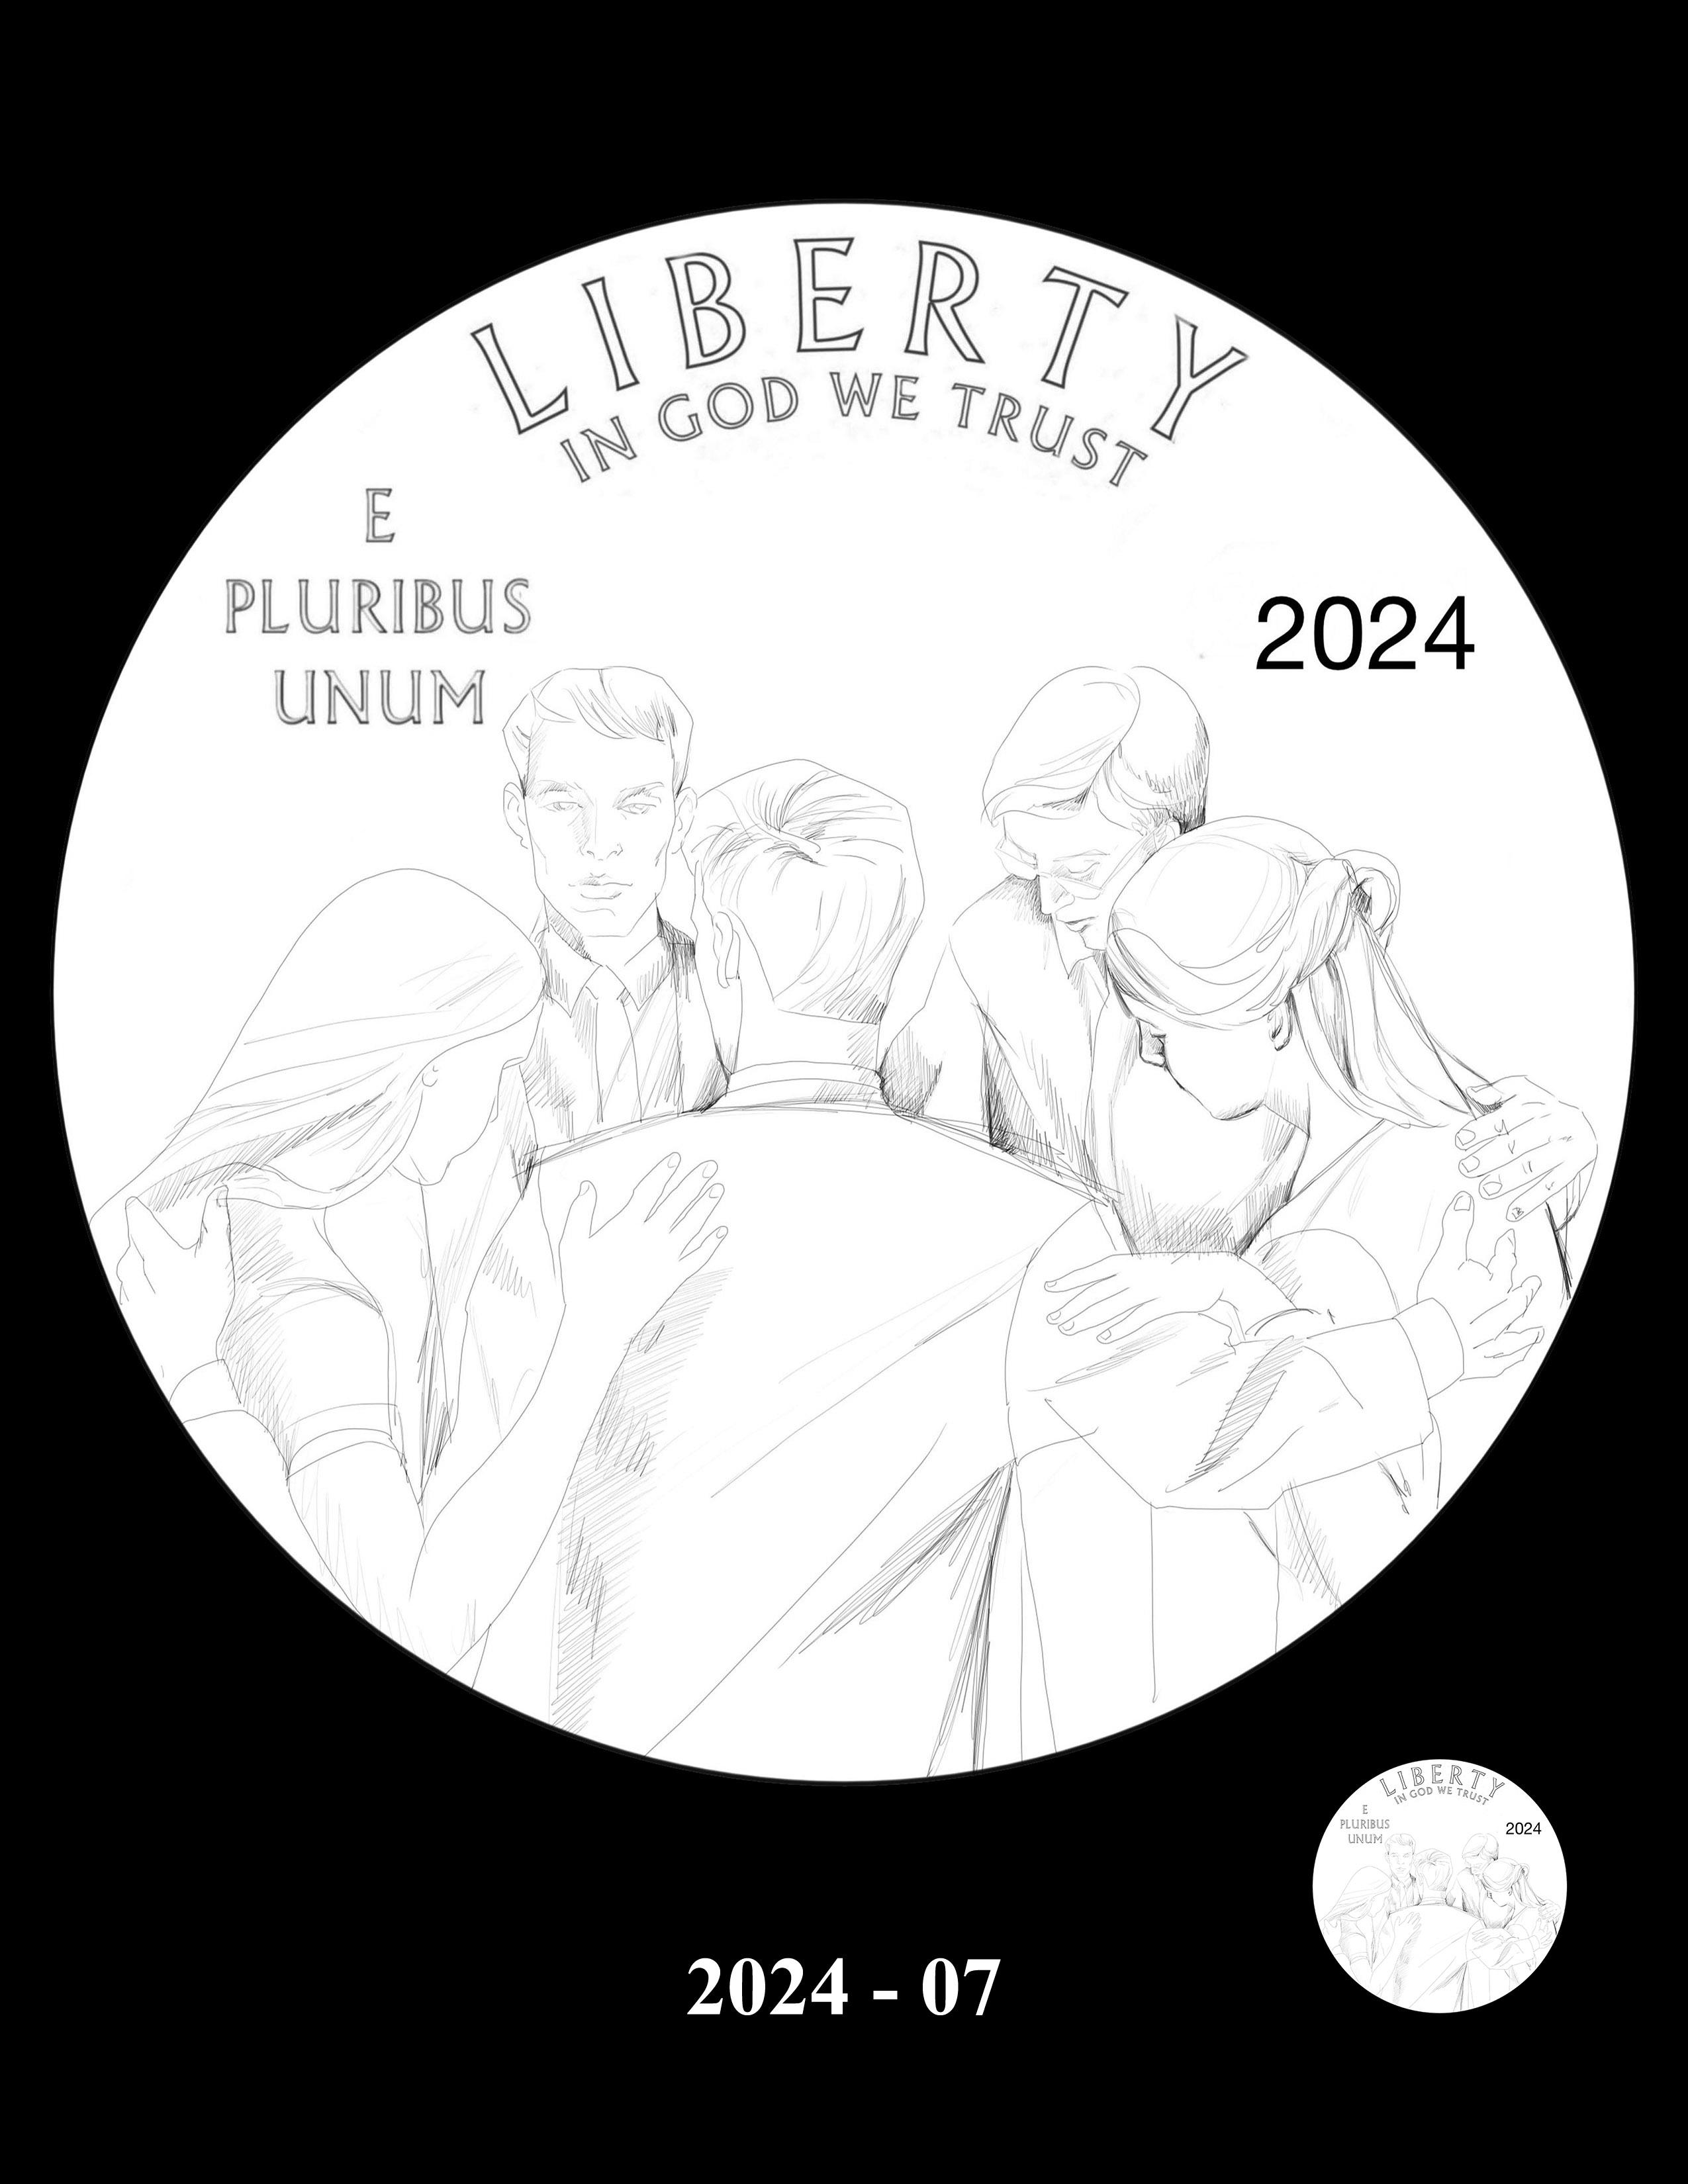 07-2024 -- 2021 - 2025 American Eagle Platinum Proof Program